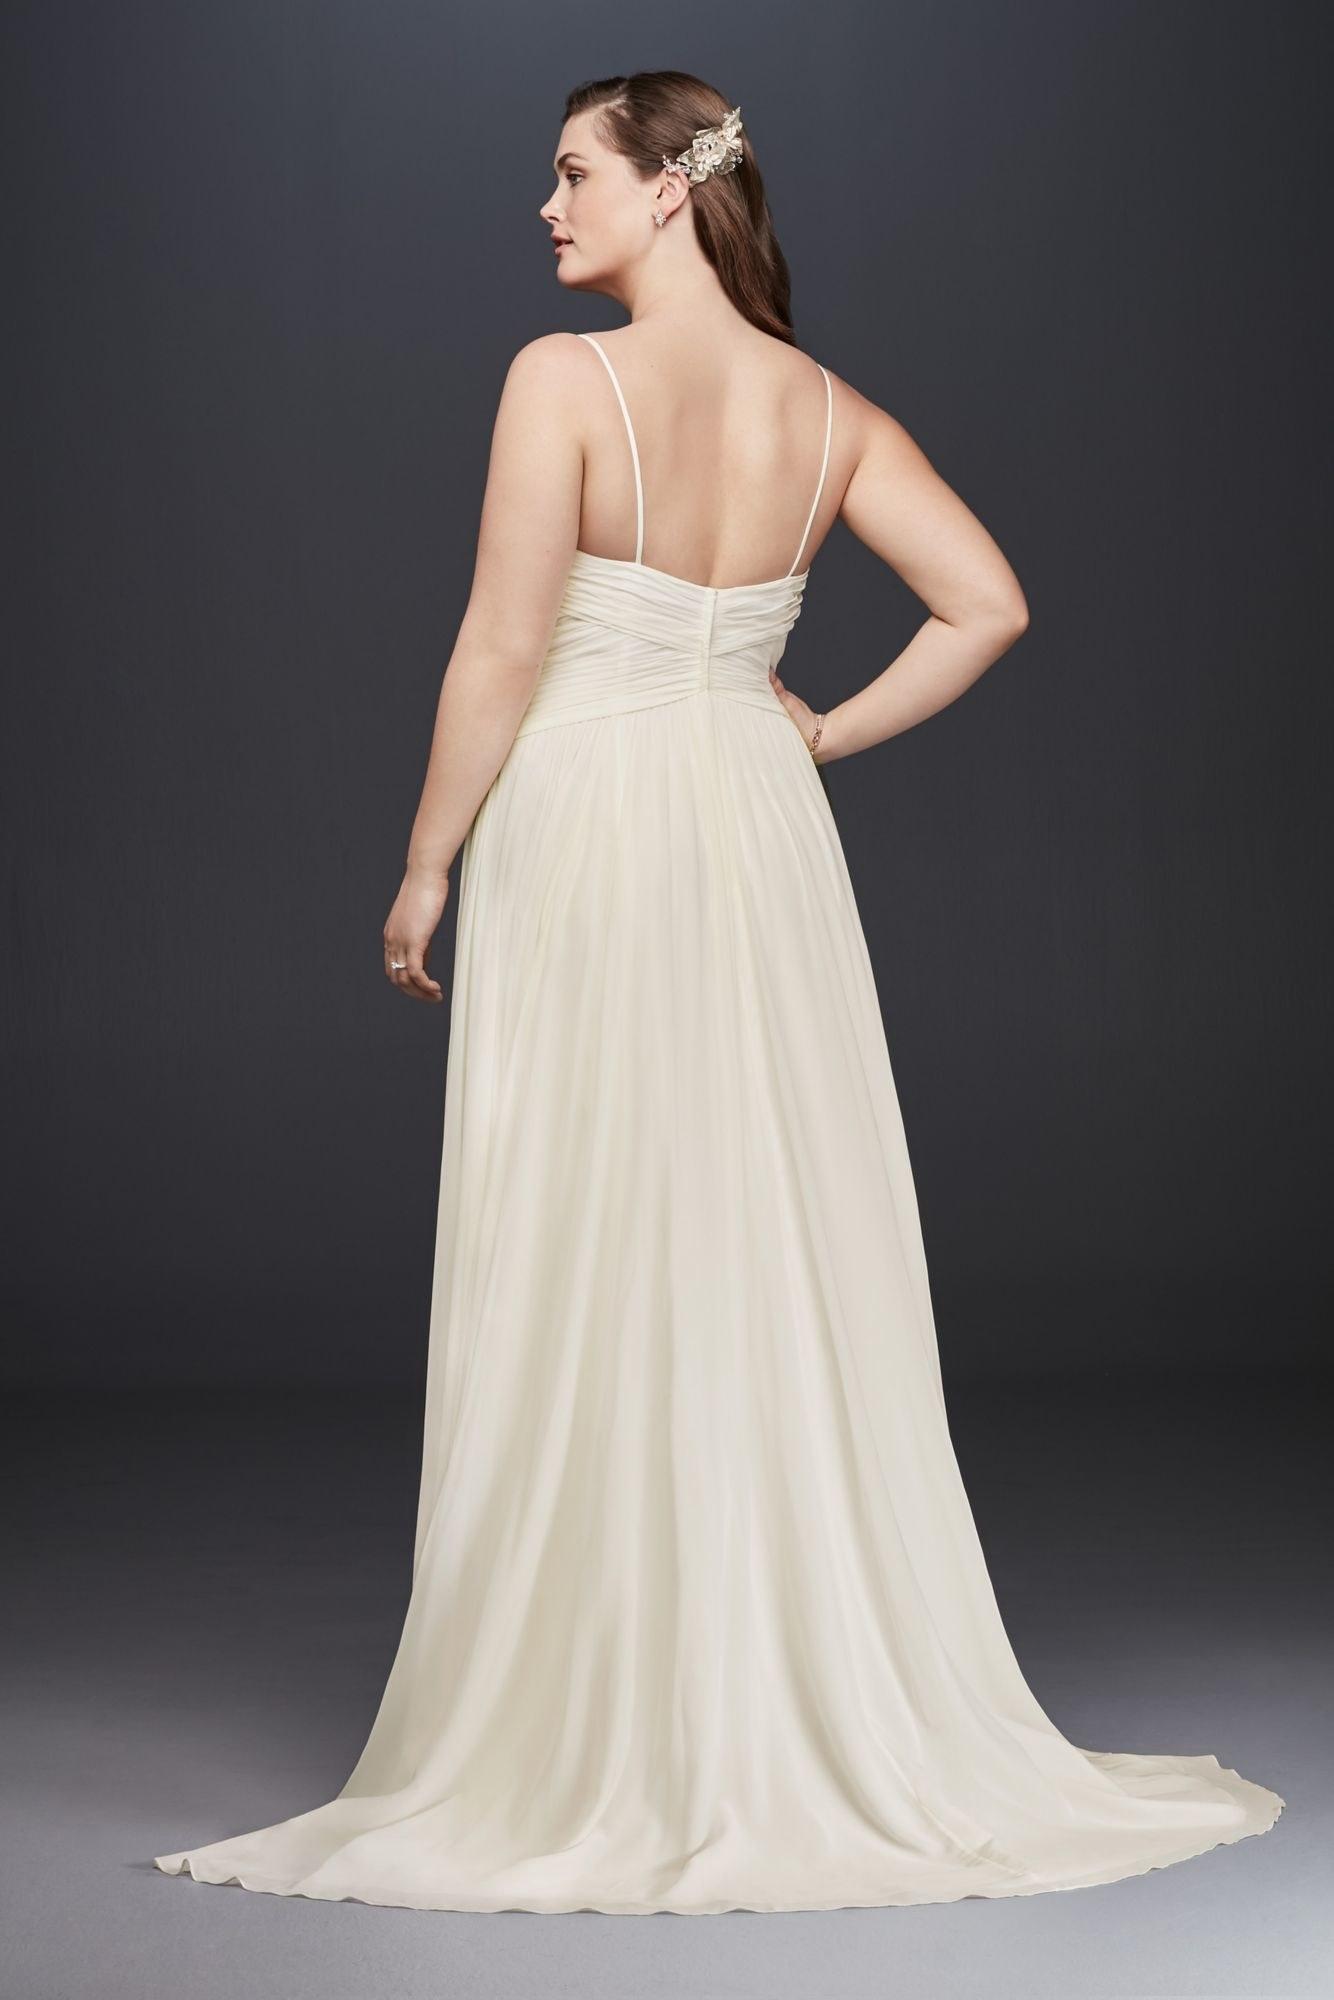 29 The Prettiest Wedding Dresses You ve Ever Seen